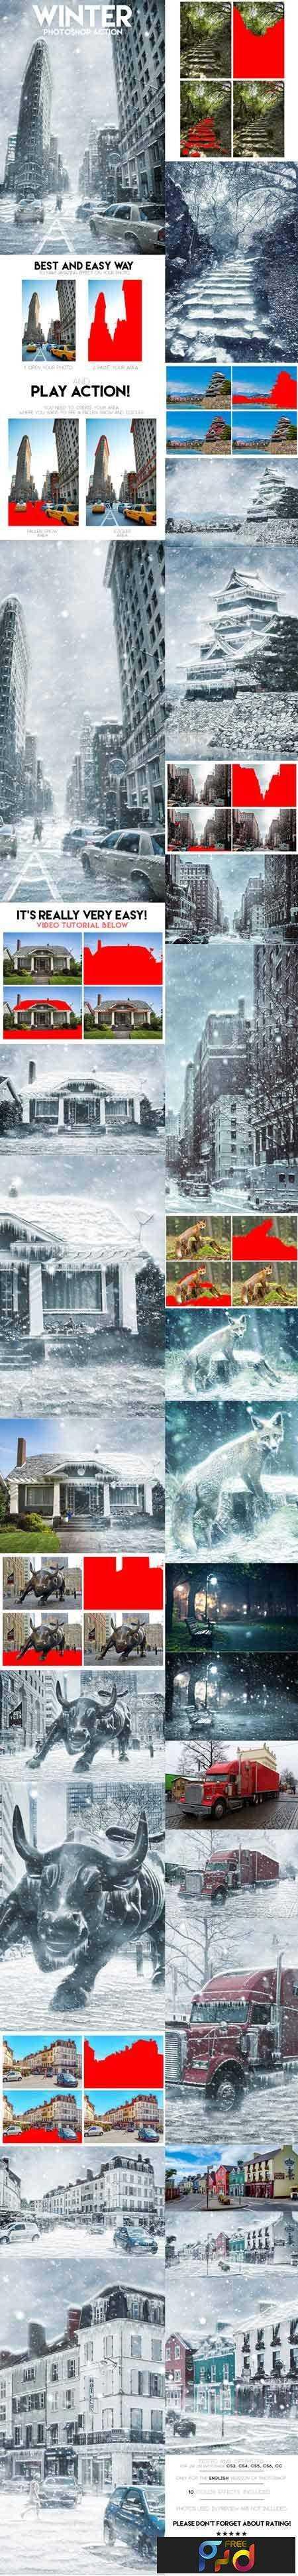 FreePsdVn.com_1702554_PHOTOSHOP_winter_photoshop_action_19315141